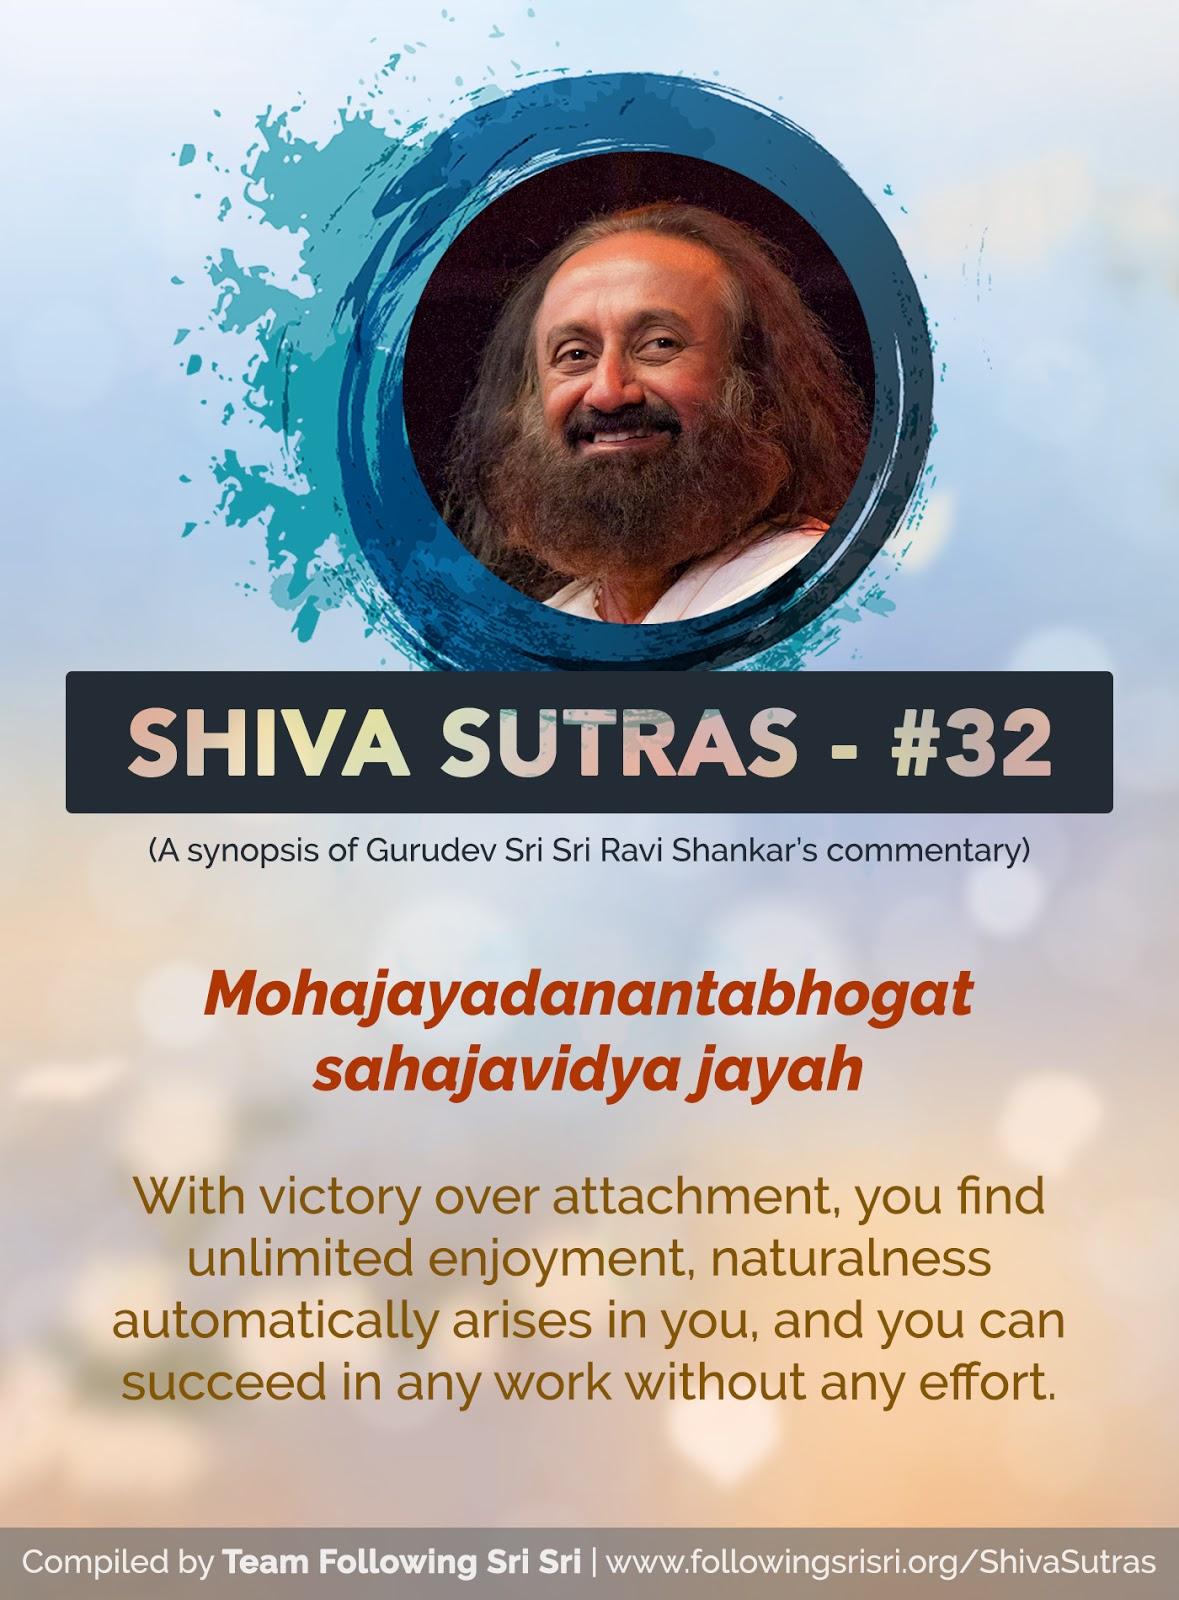 Shiva Sutras - Sutra 32